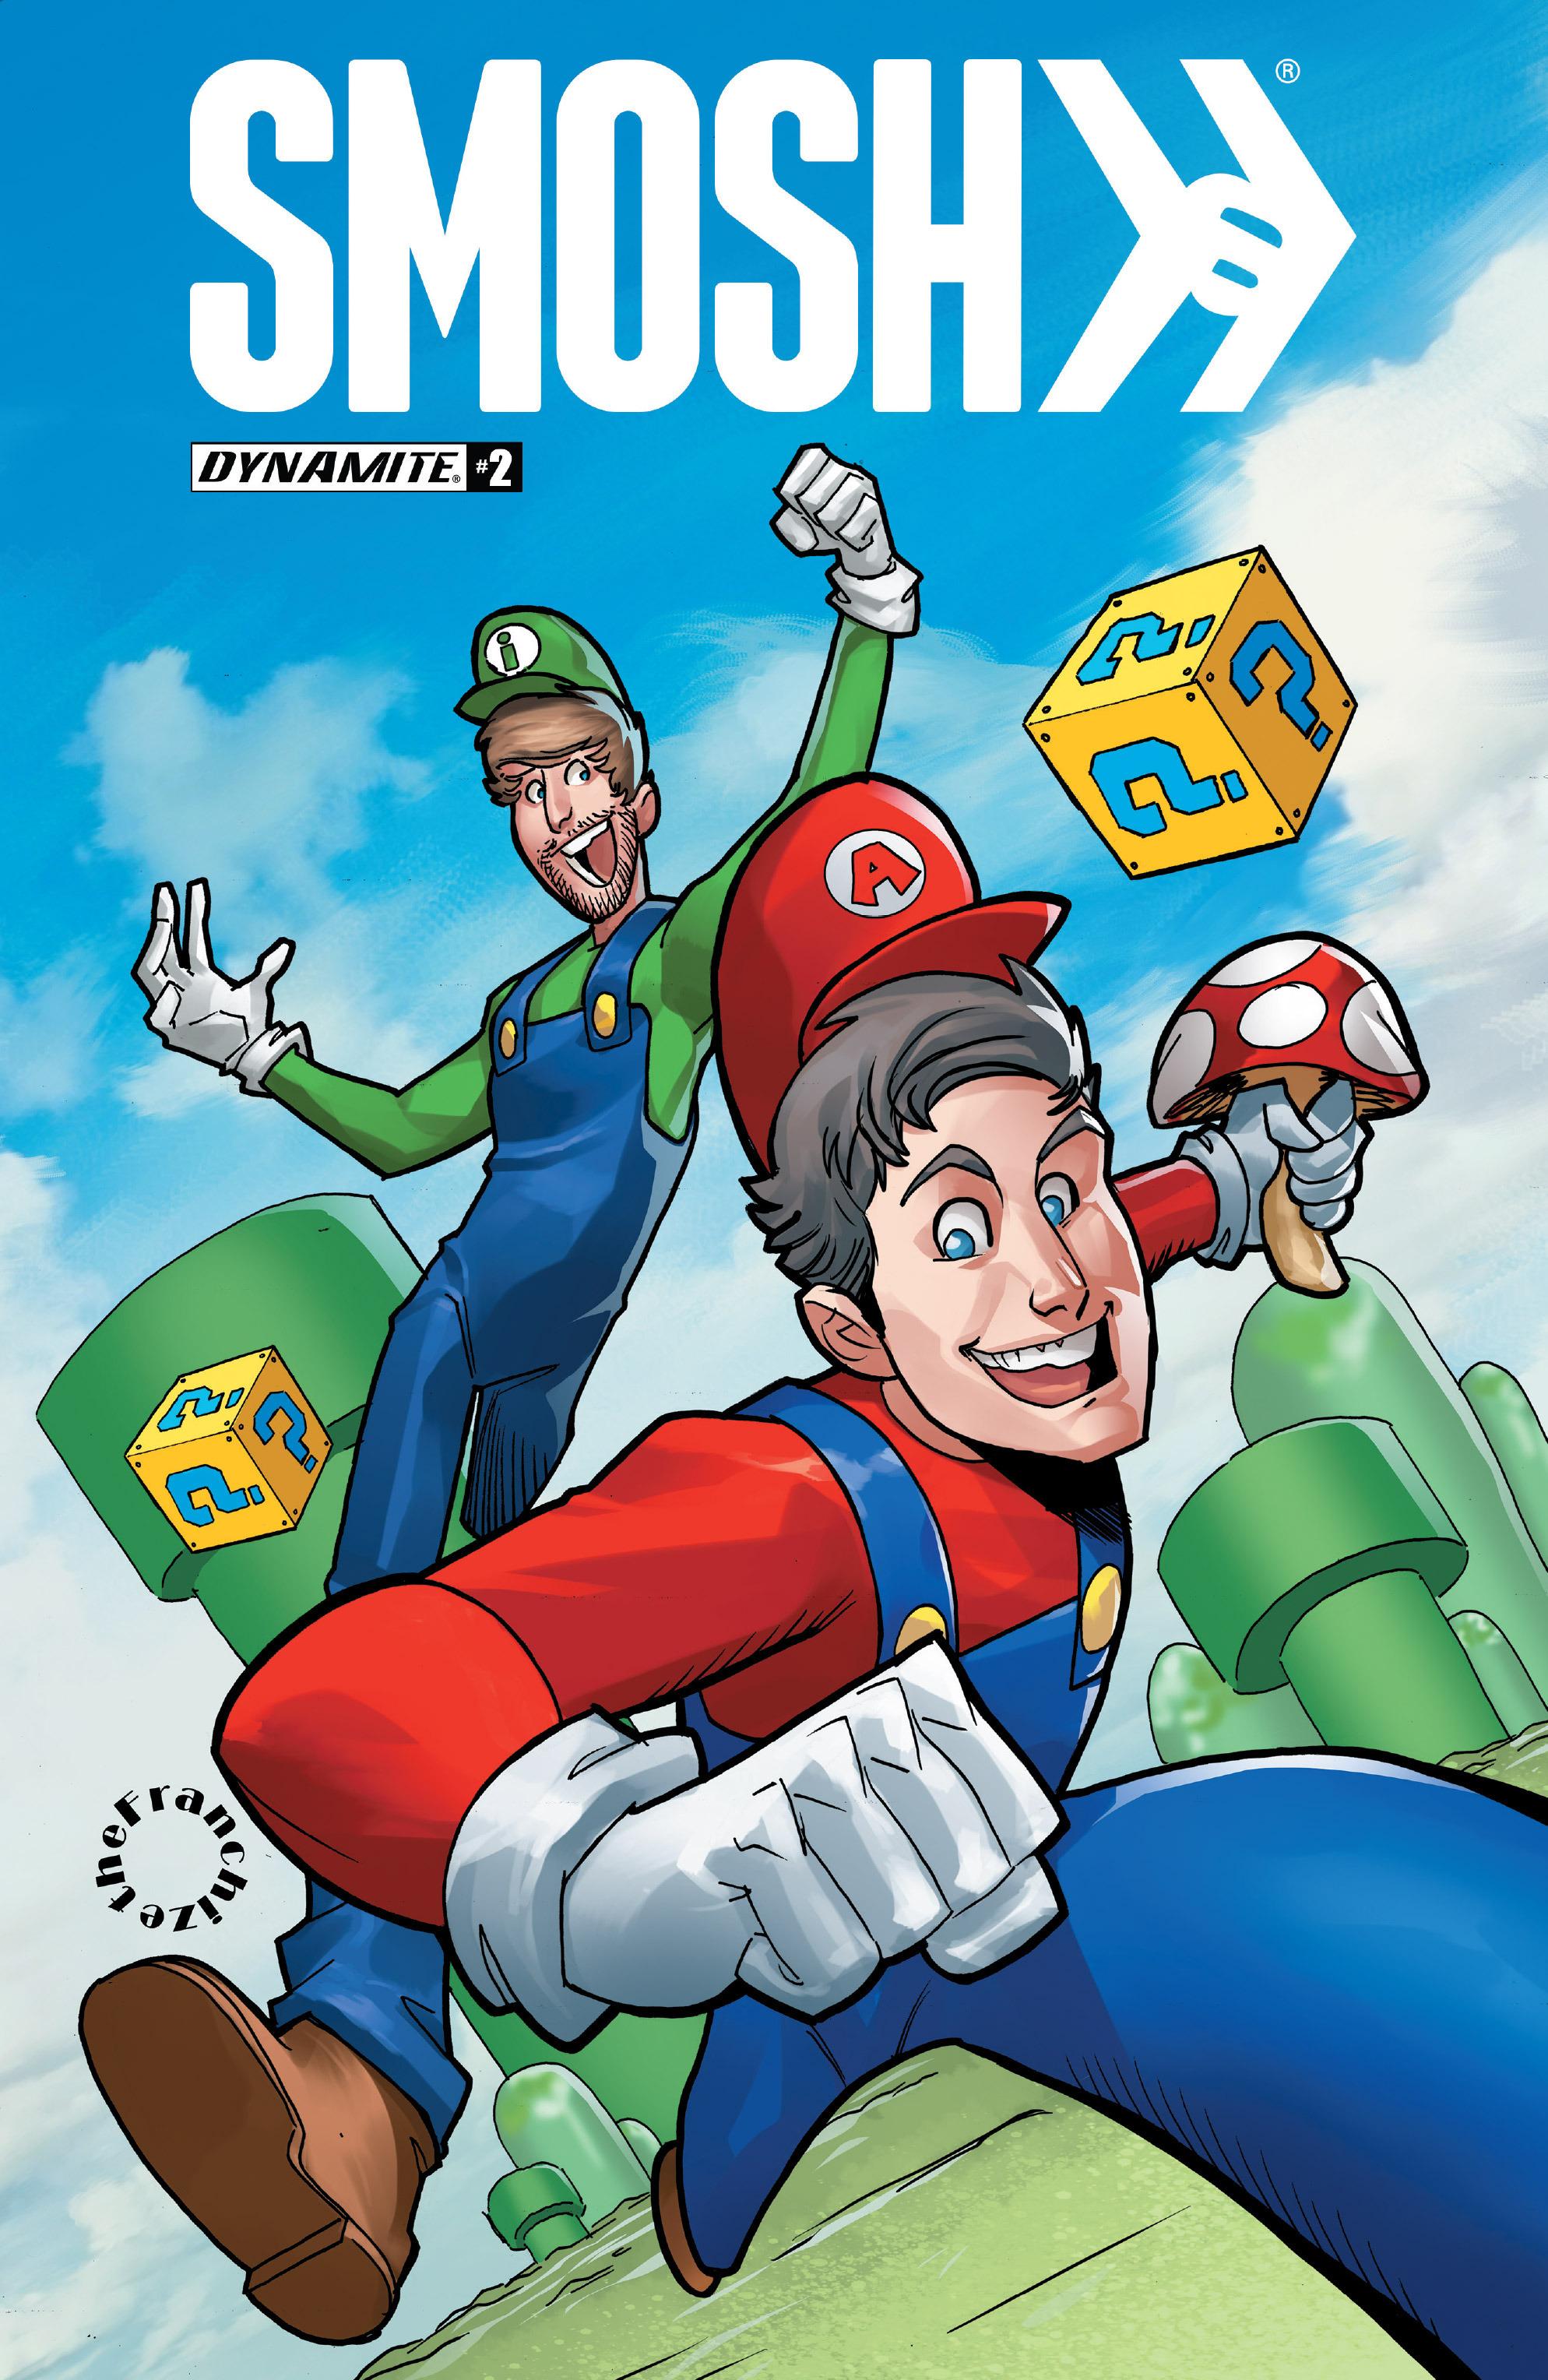 Read online Smosh comic -  Issue #2 - 2